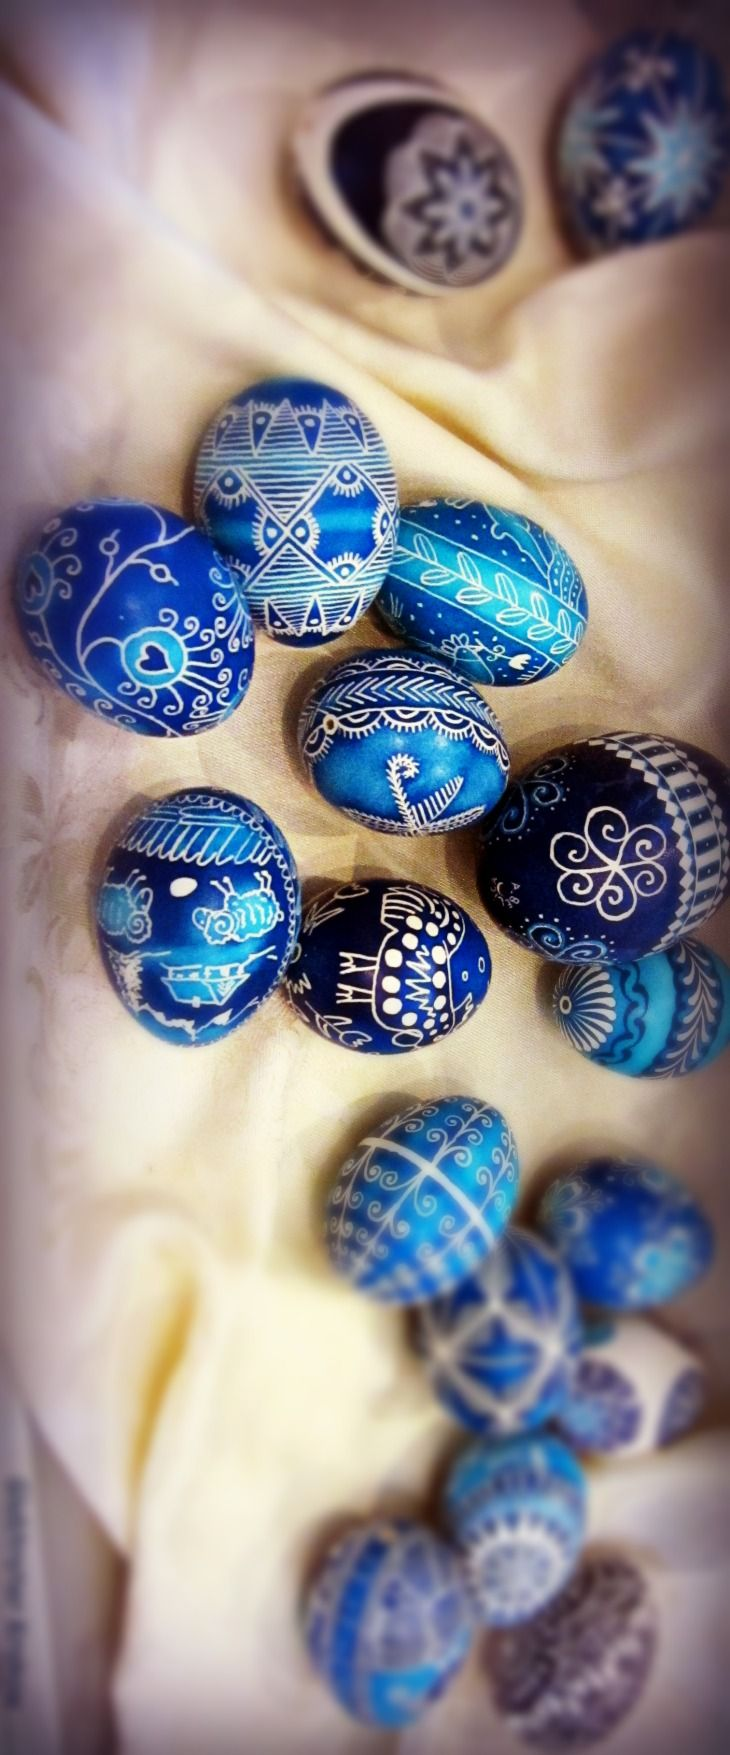 Polish Easter Eggs, Krakow, Poland